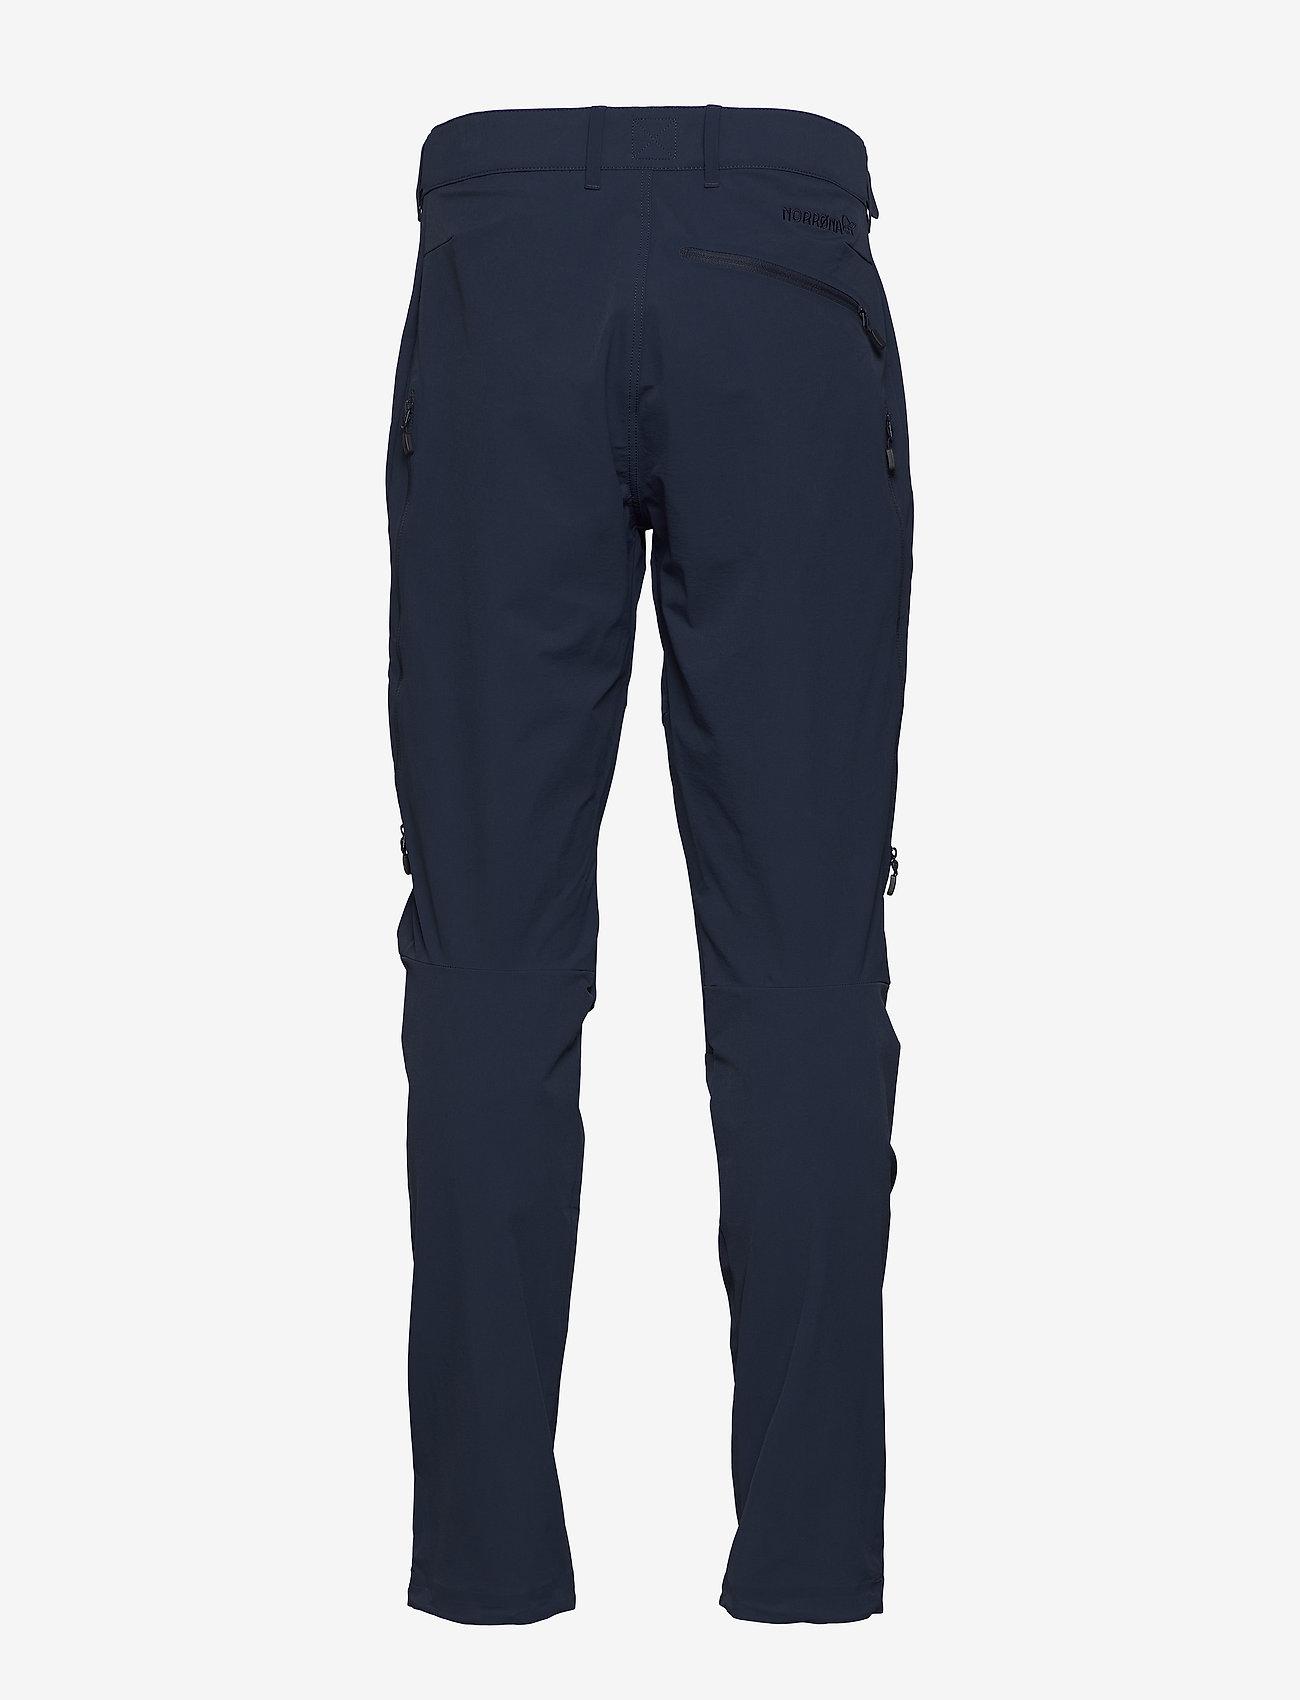 Norrøna - falketind flex1 Pants M's - softshellhose - indigo night - 1